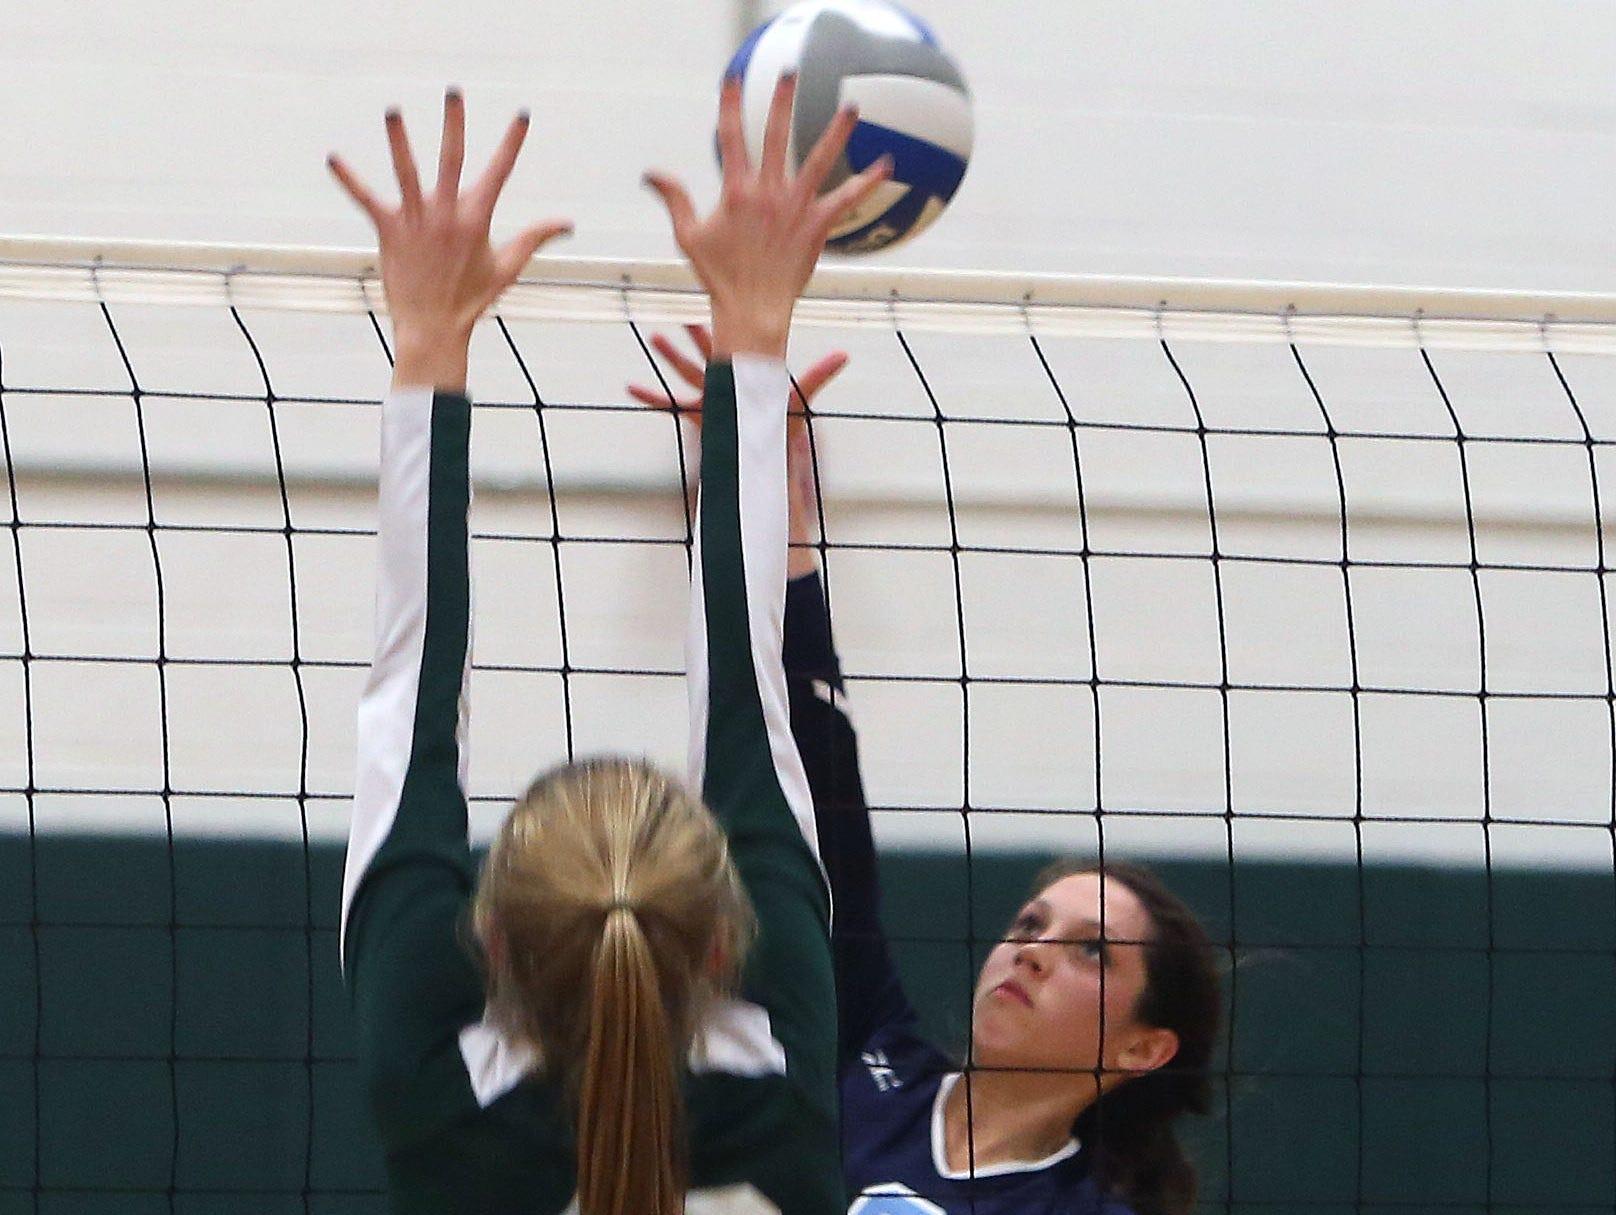 Westlake's Nicolette Shkreli (2) gets a shot by Pleasantville's Annie Stockel (10) during volleyball action at Pleasantville High School Sept. 30, 2015.